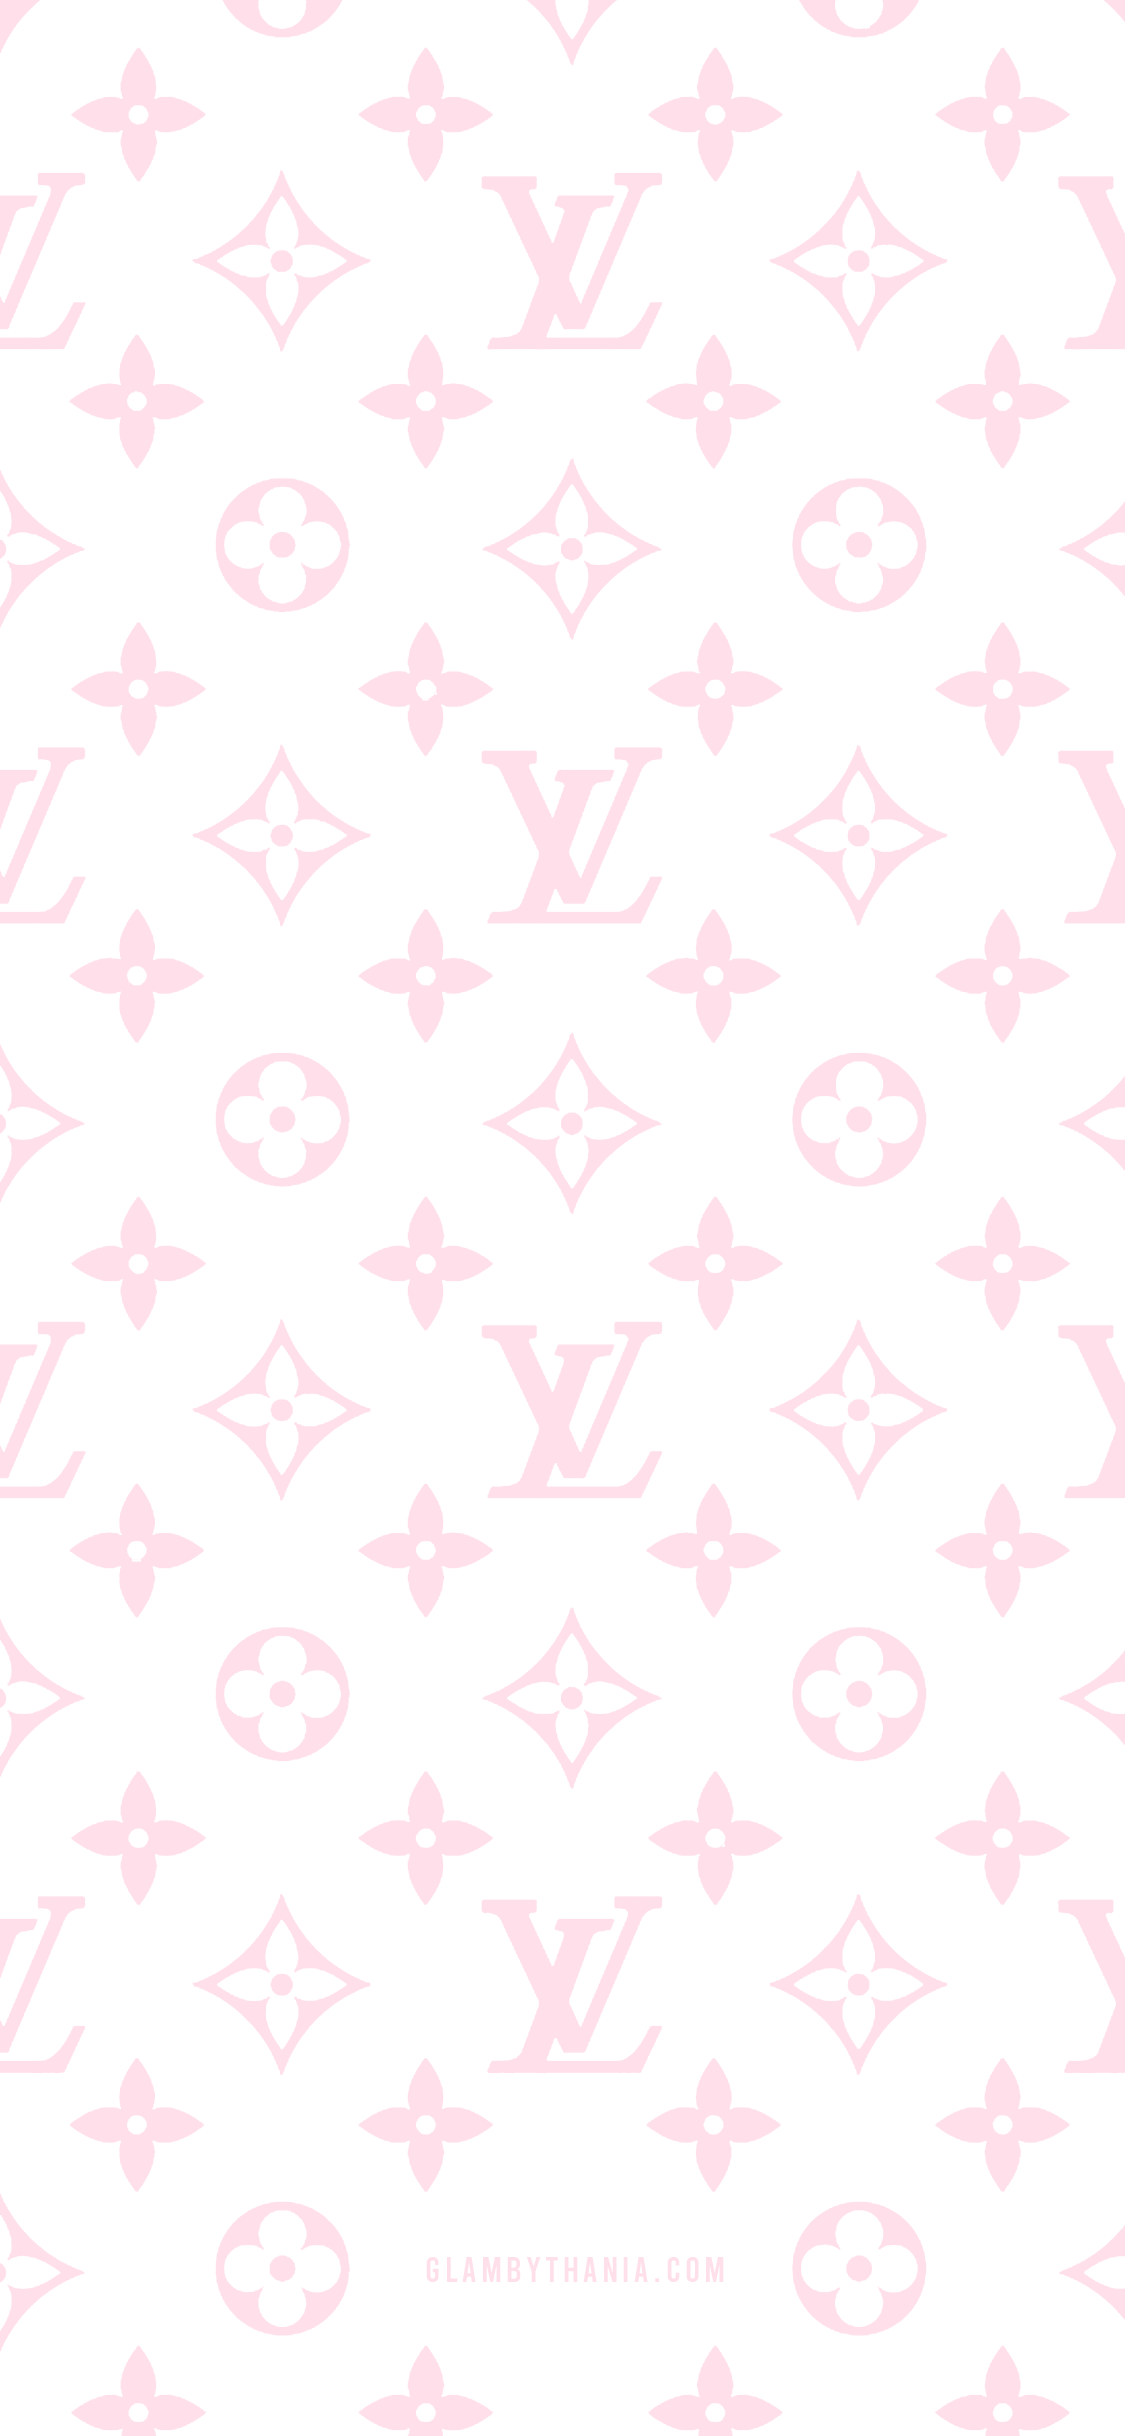 Sfondi Gratis Designer Girly Rosa Iphone Pink Wallpaper Girly Iphone Homescreen Wallpaper Pink Wallpaper Iphone